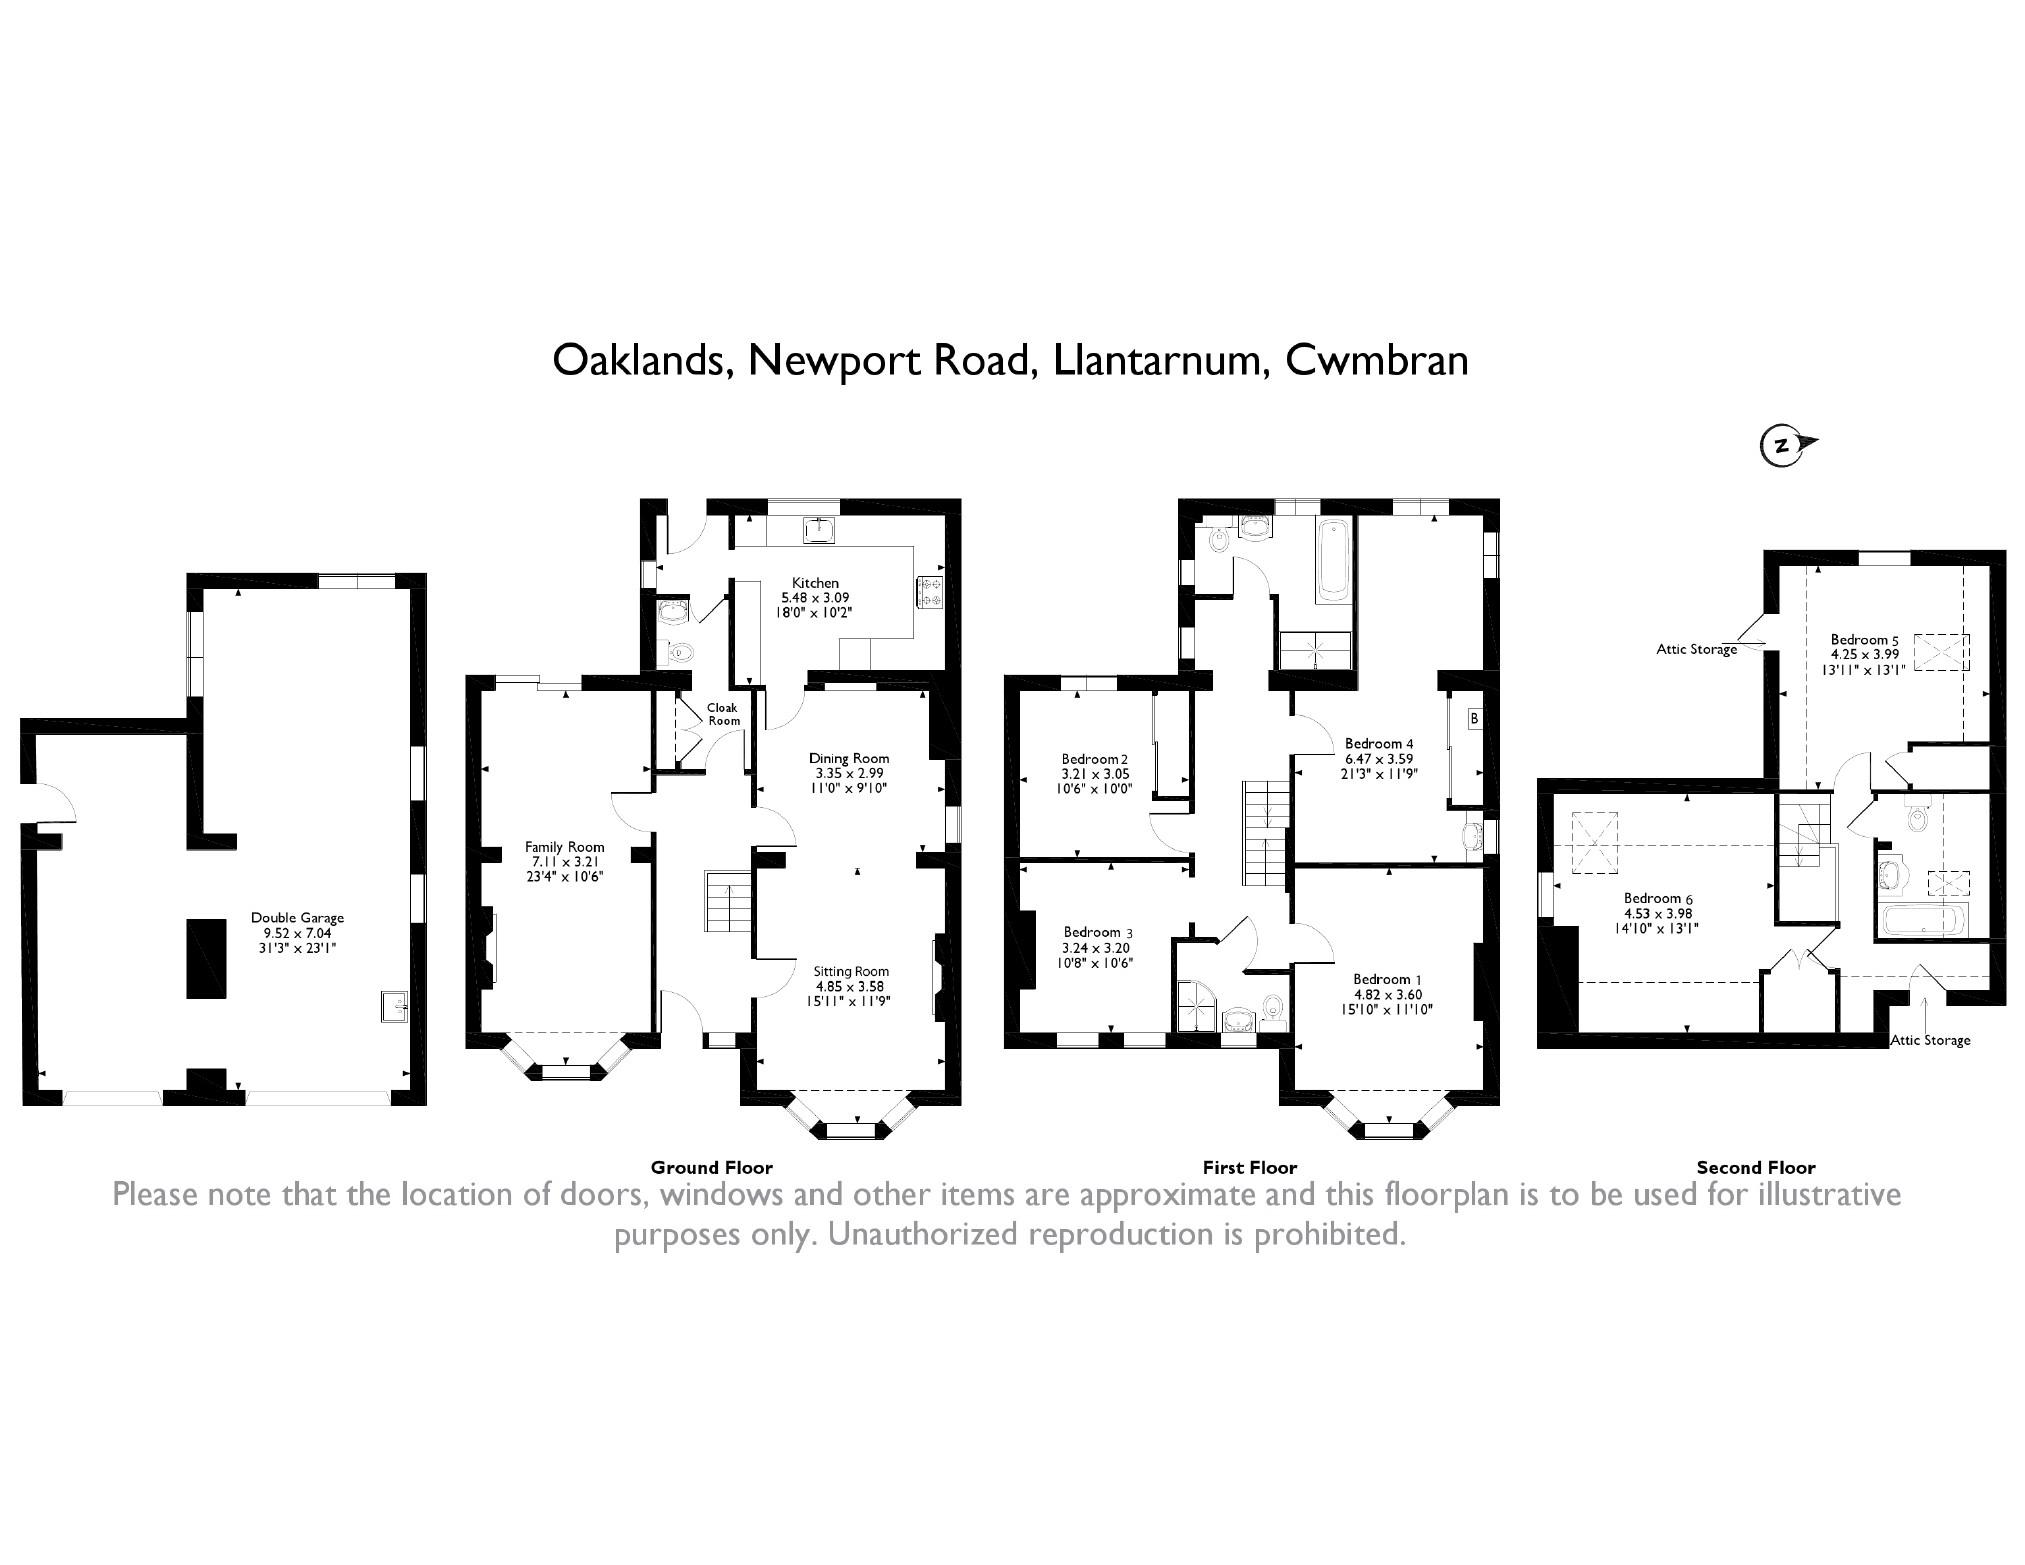 6 bedroom Detached House for sale in Llantarnam